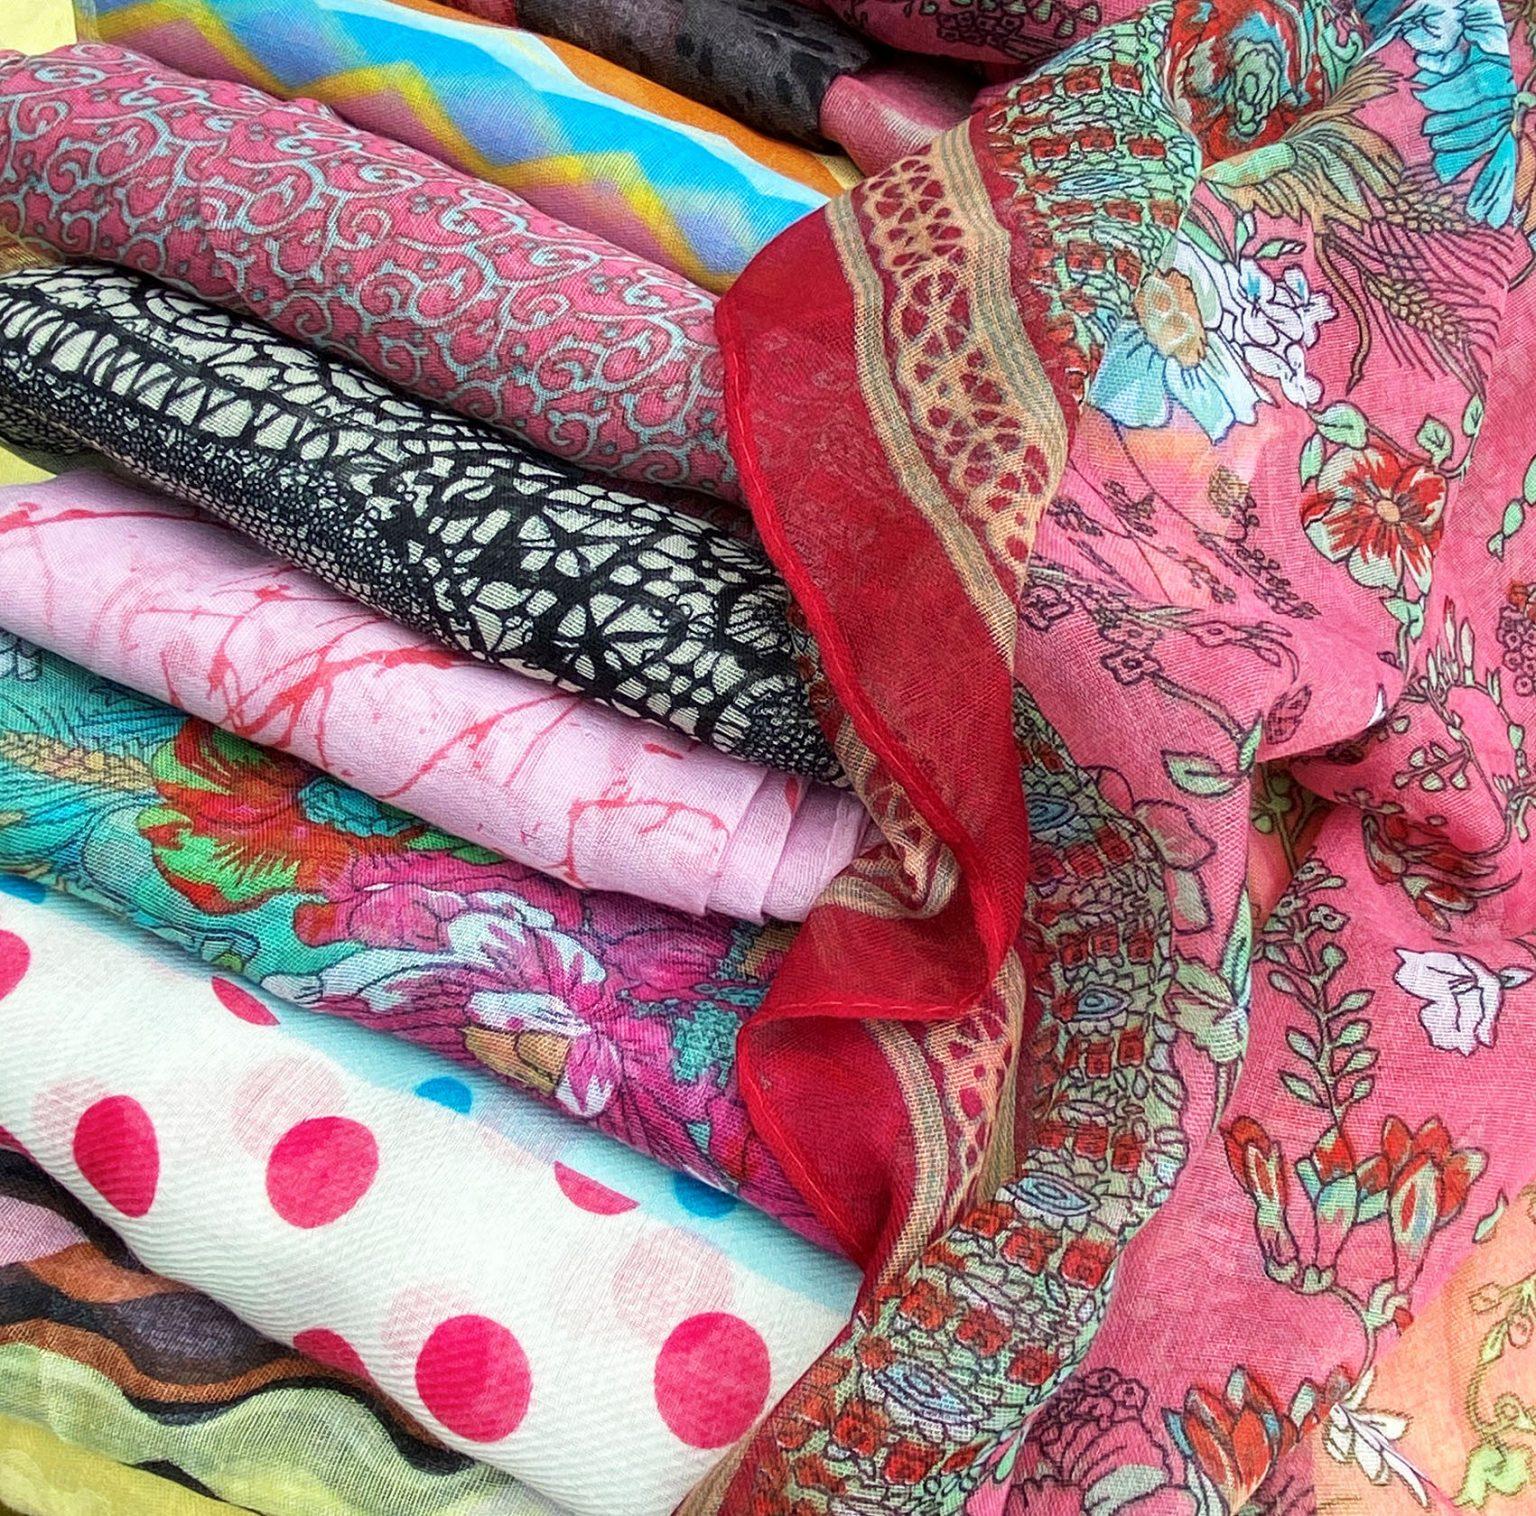 Surprise scarf offer – Bag a sensational scarf bundle!